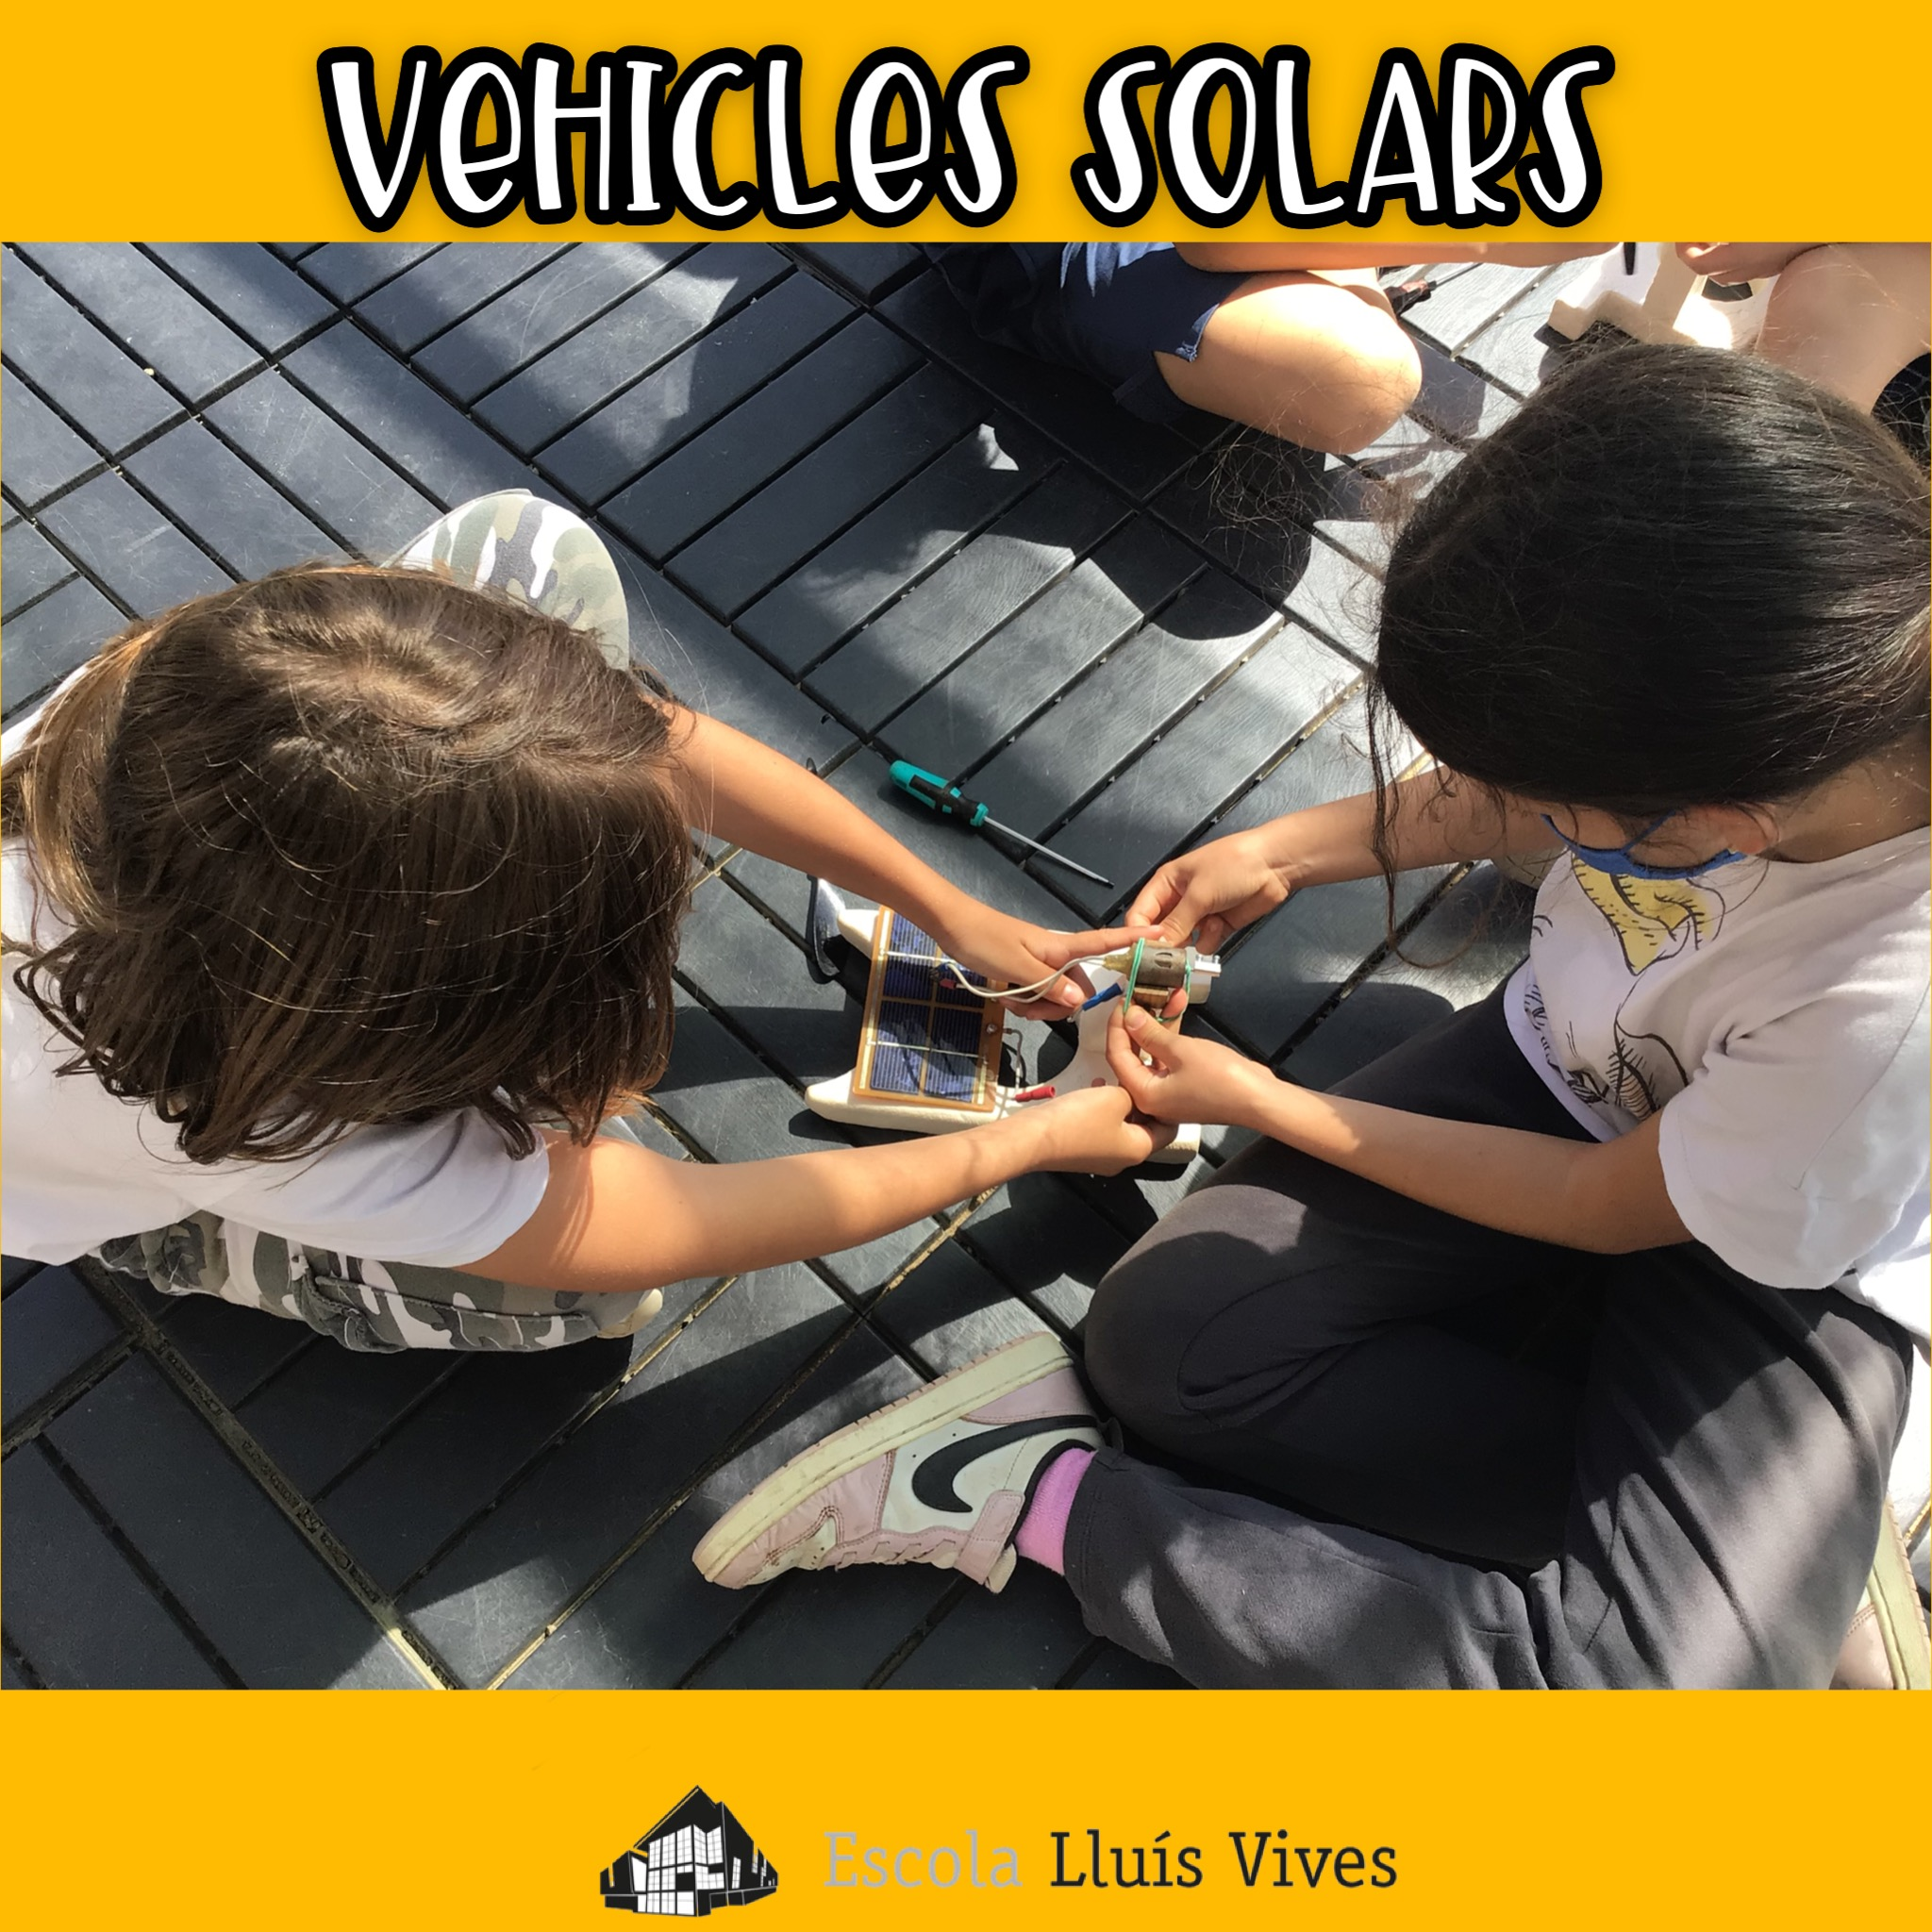 Vehicles solars 4t